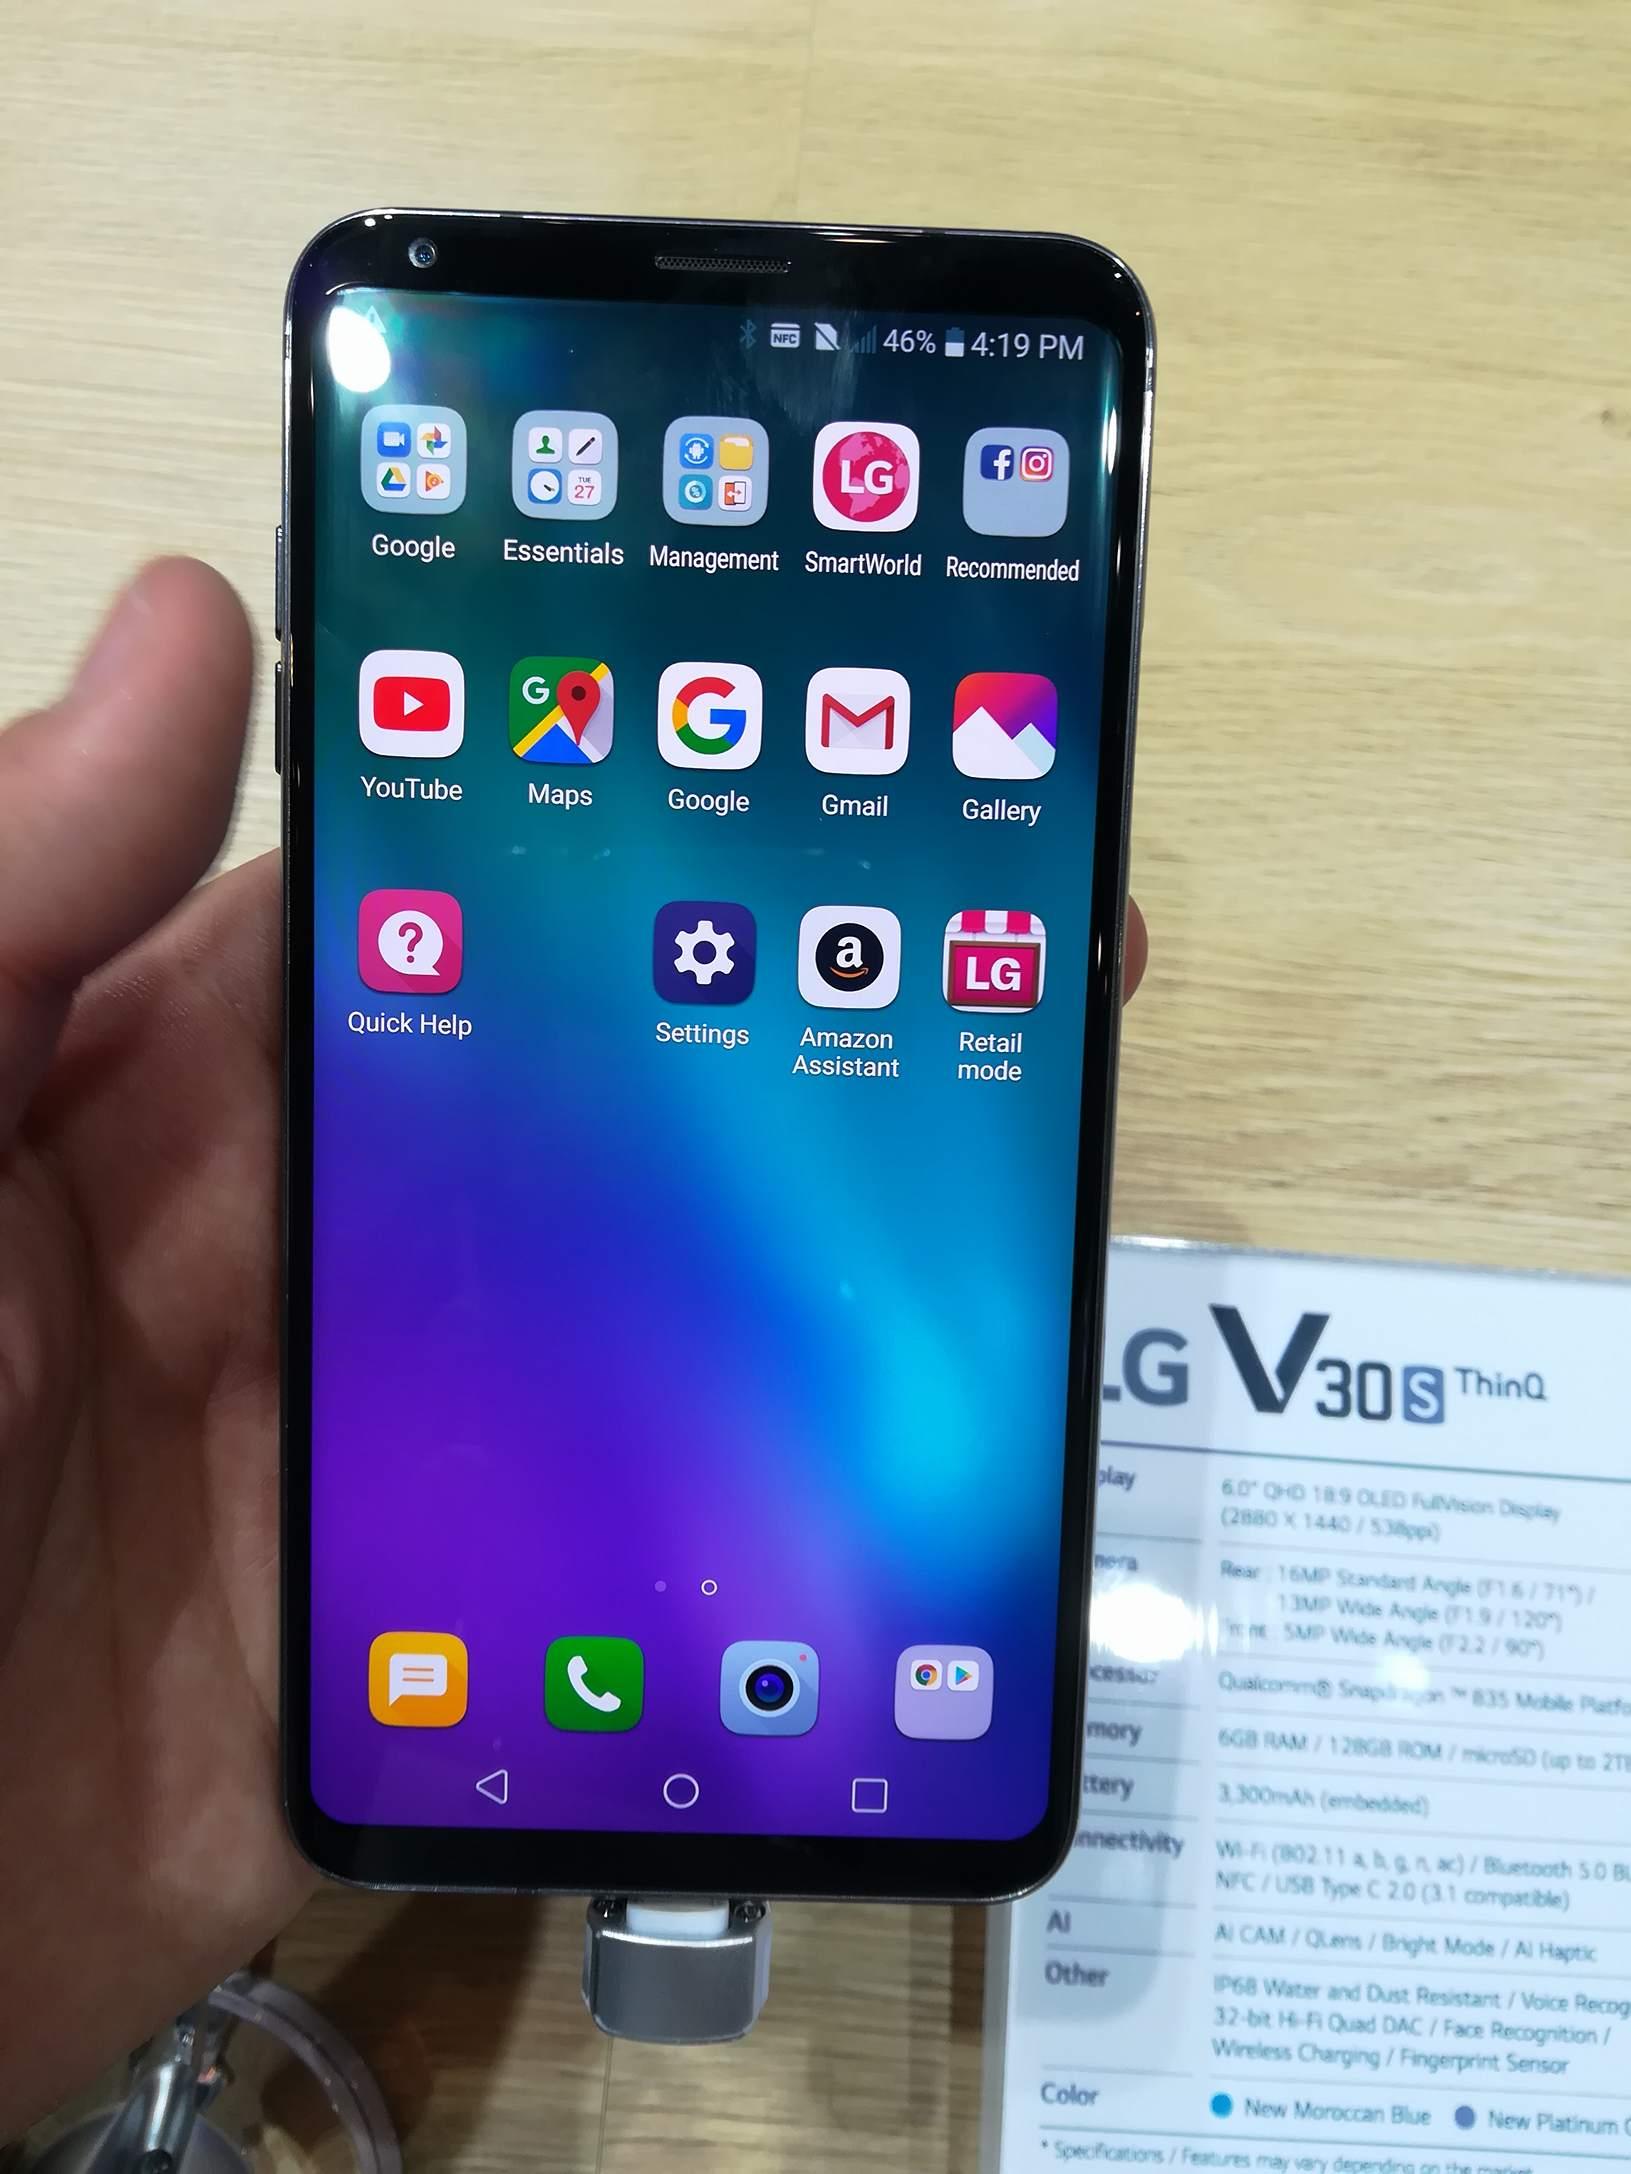 El LG V30S THINQ se deja ver en el MWC 2018 - La nueva apuesta de LG en telefonía e Inteligencia artificial